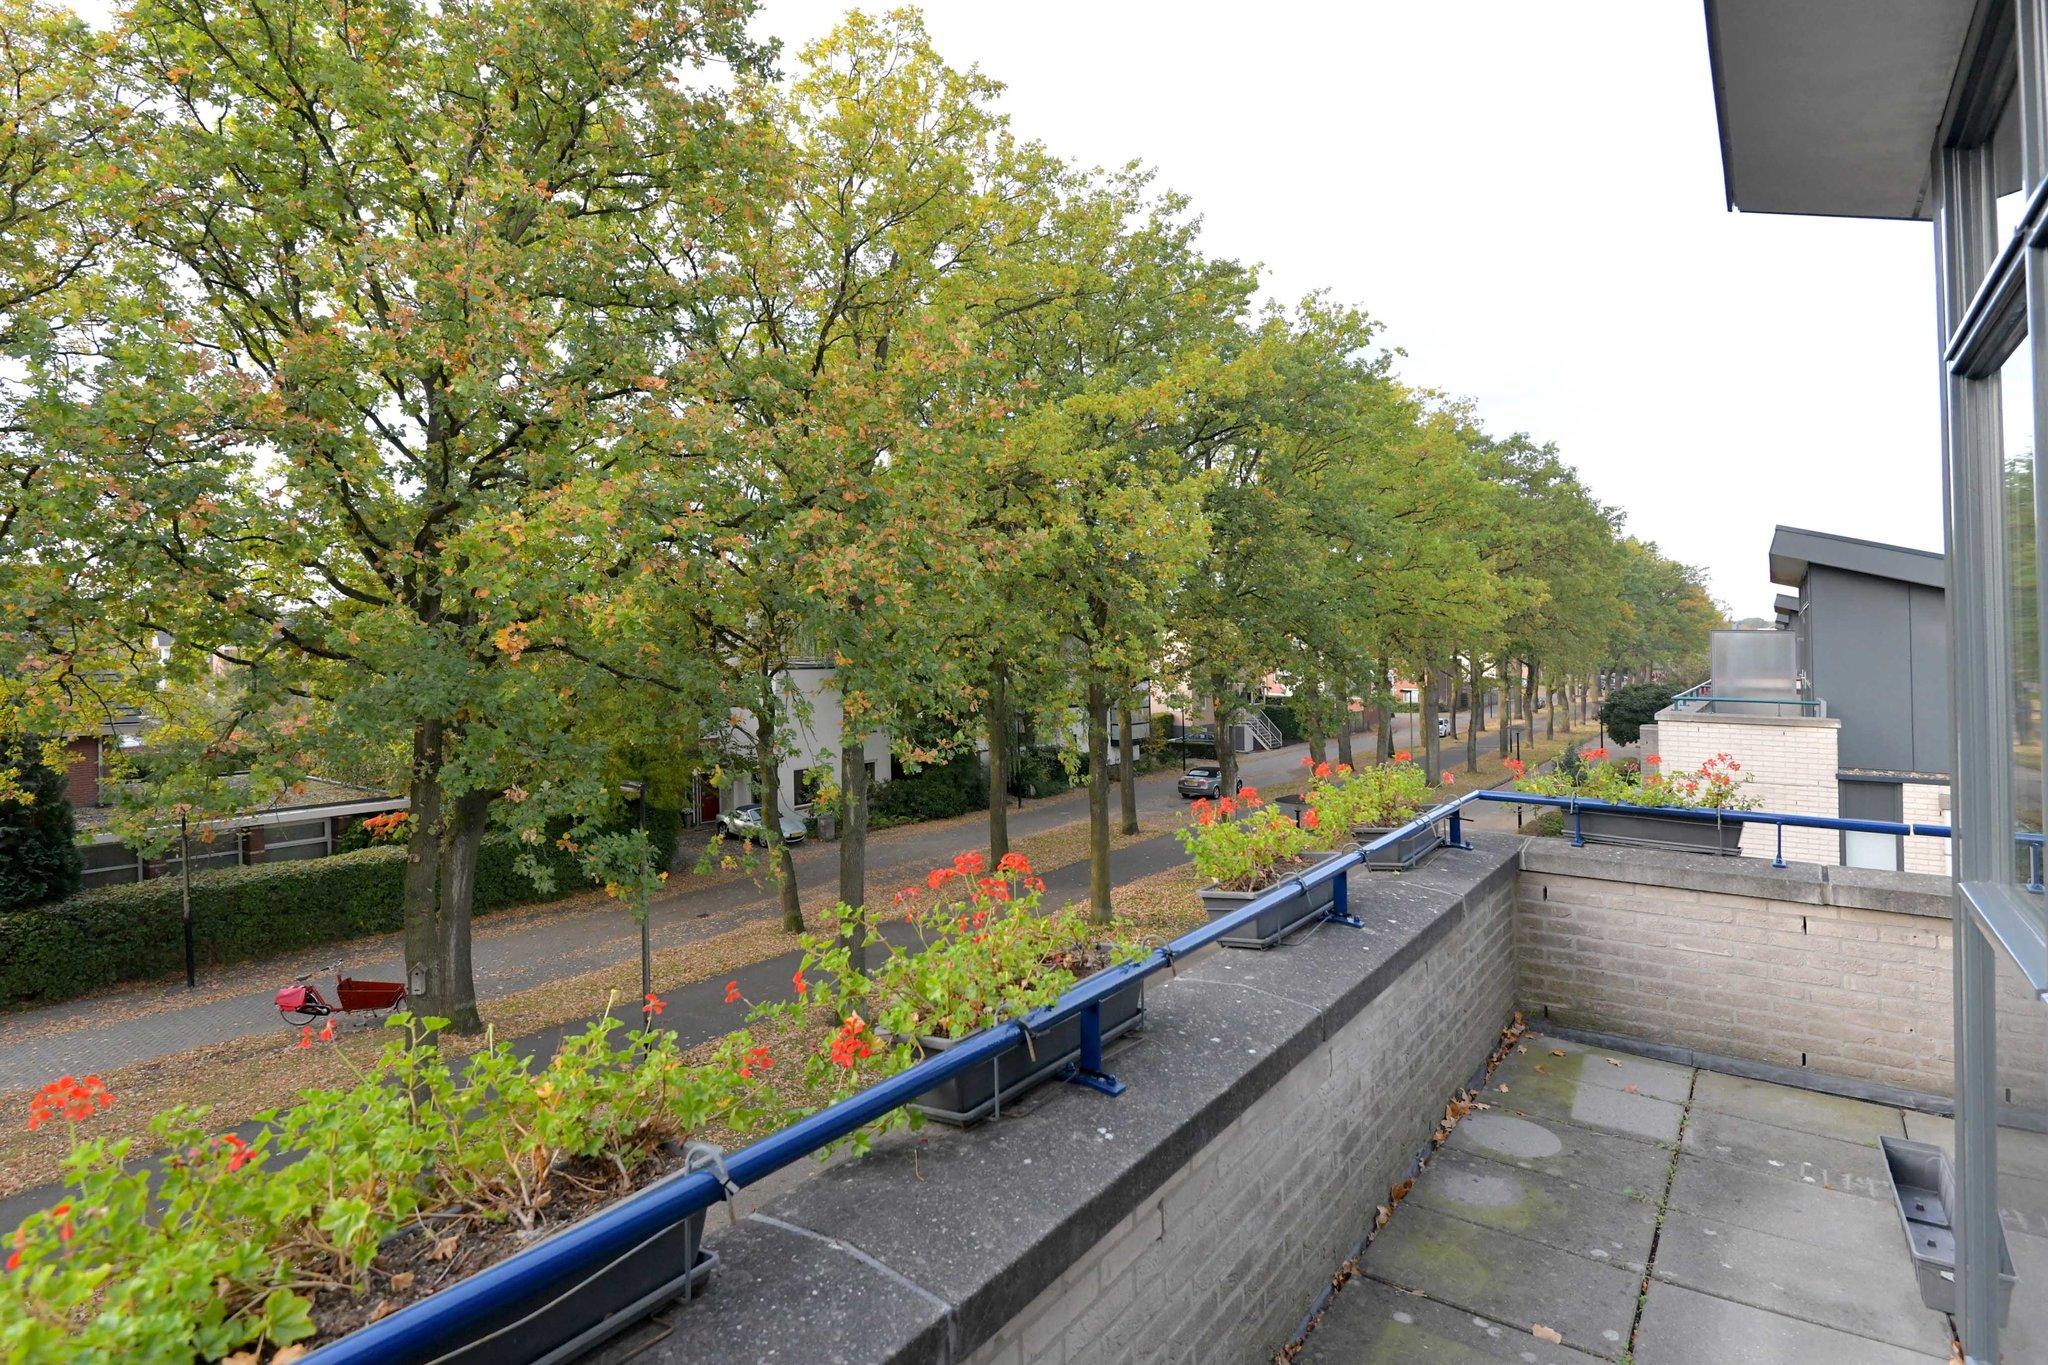 deventer-willem-landrestraat-4226710-foto-30.jpg